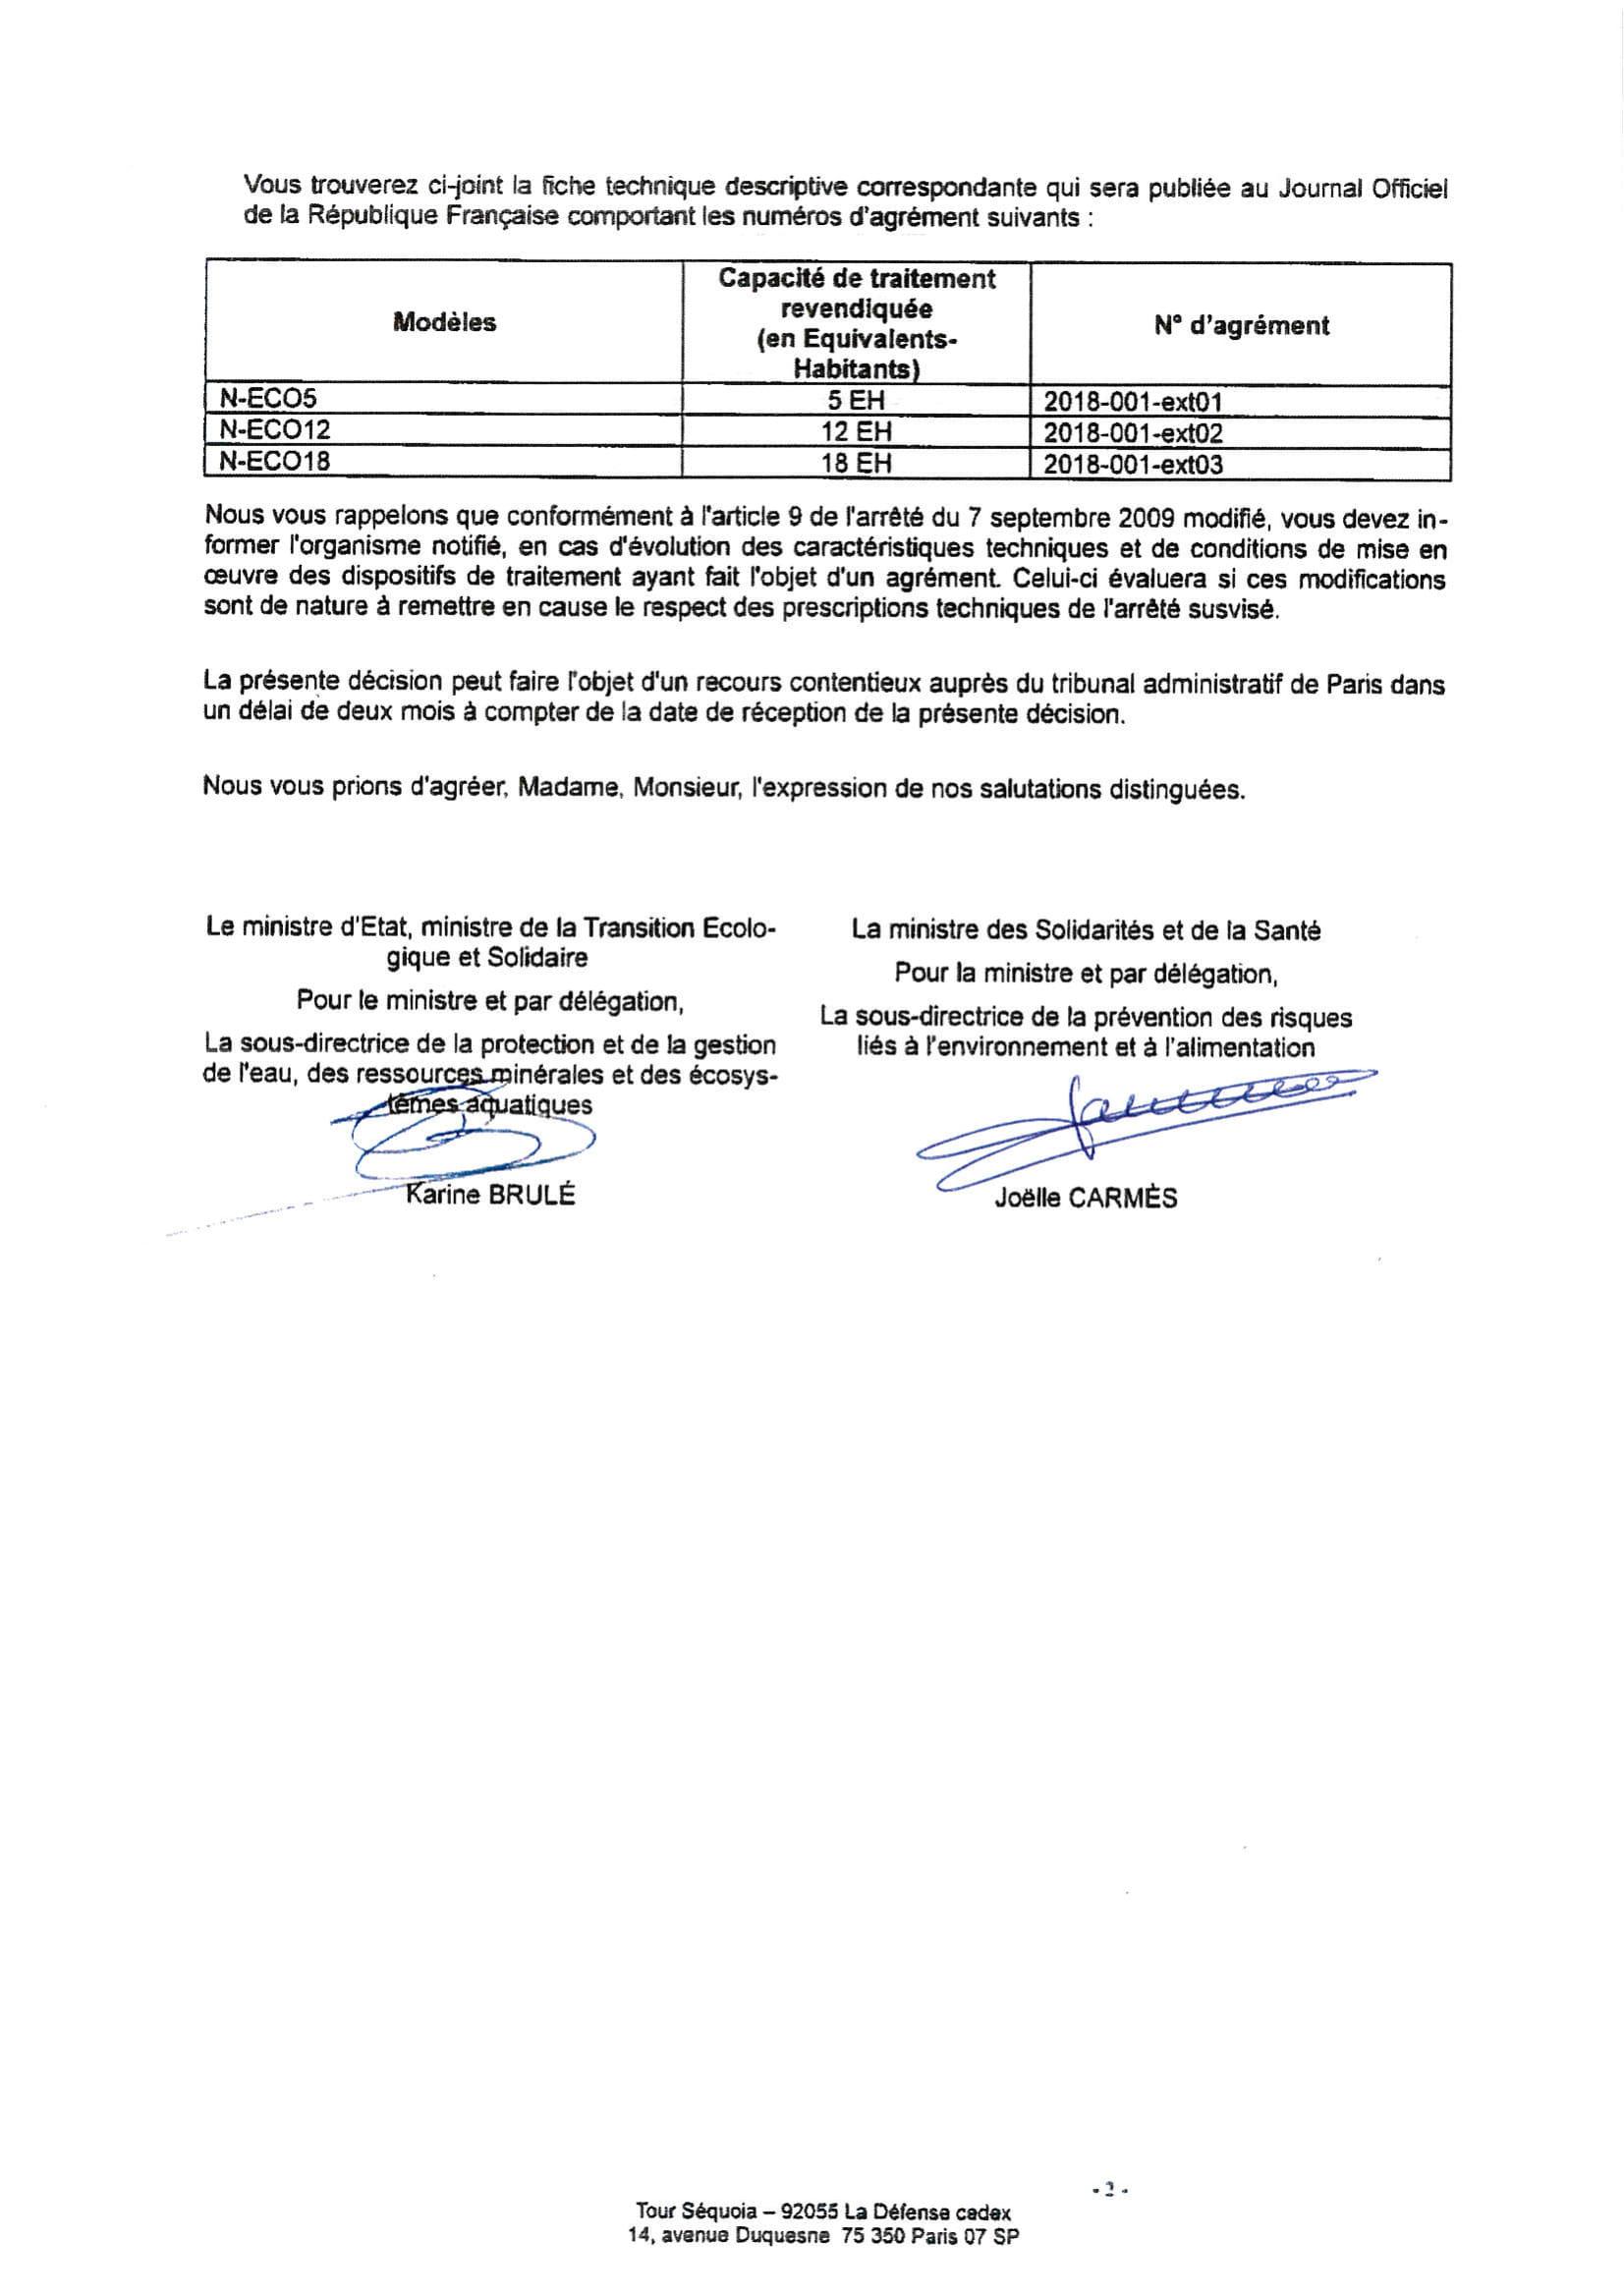 Ntg Nouveau Agrment Franais New French Agreement